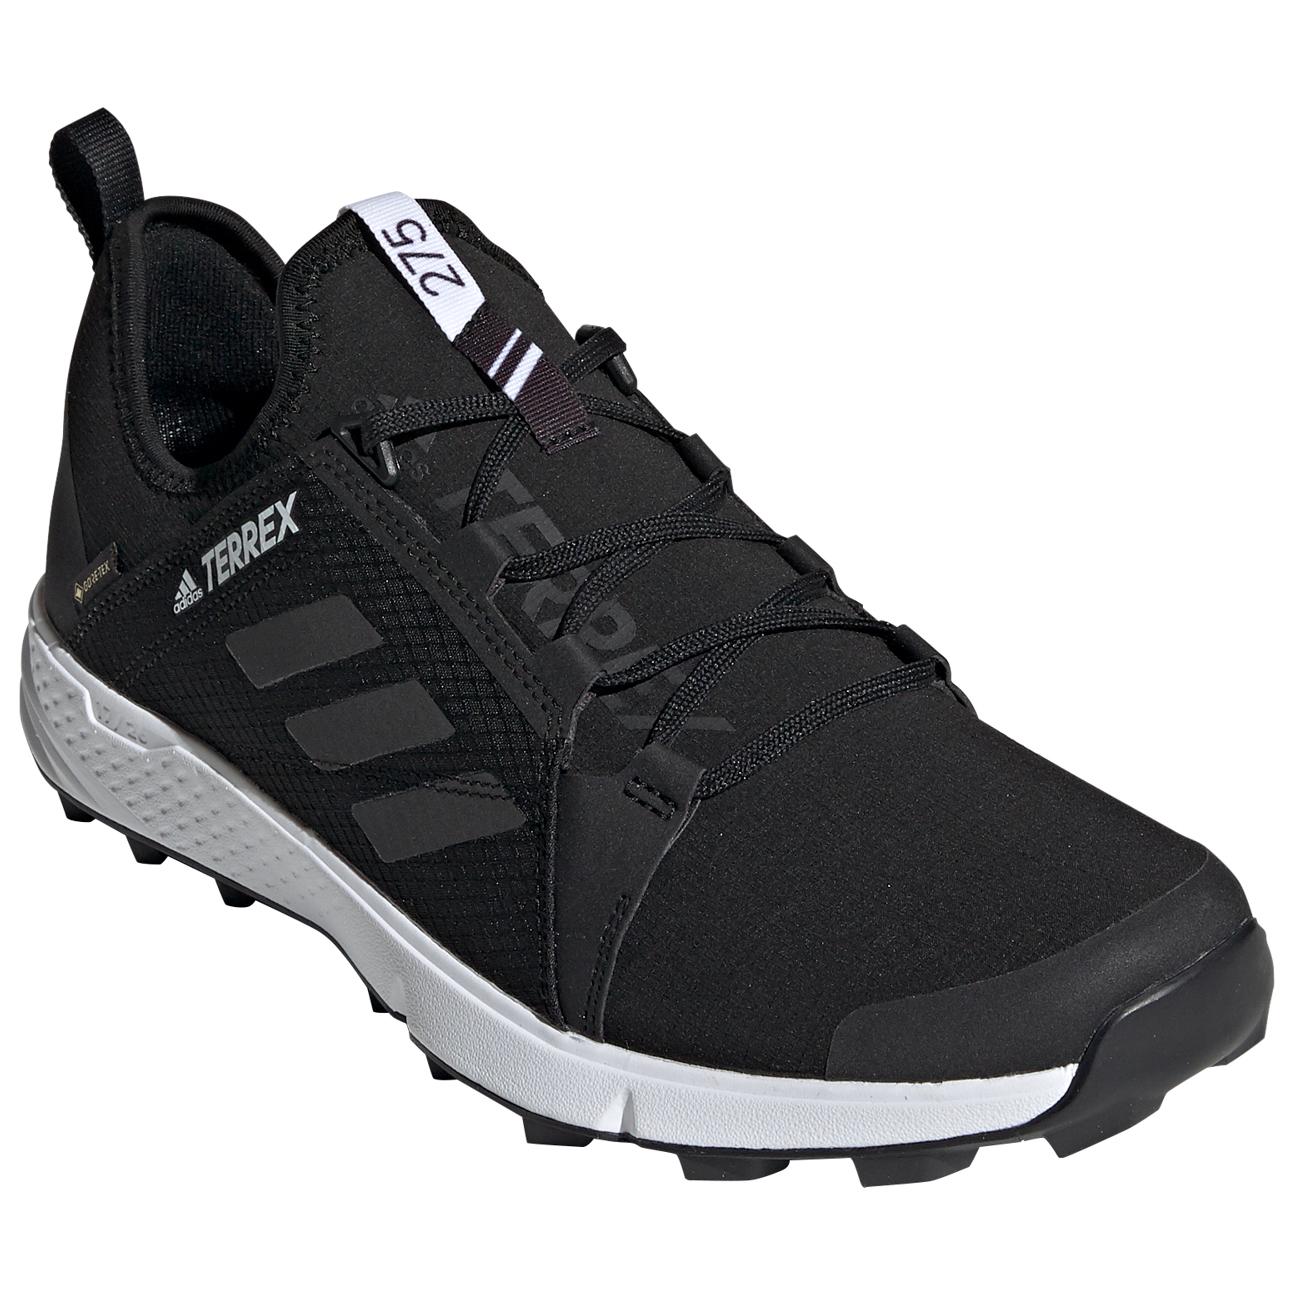 Adidas Terrex Speed GTX W